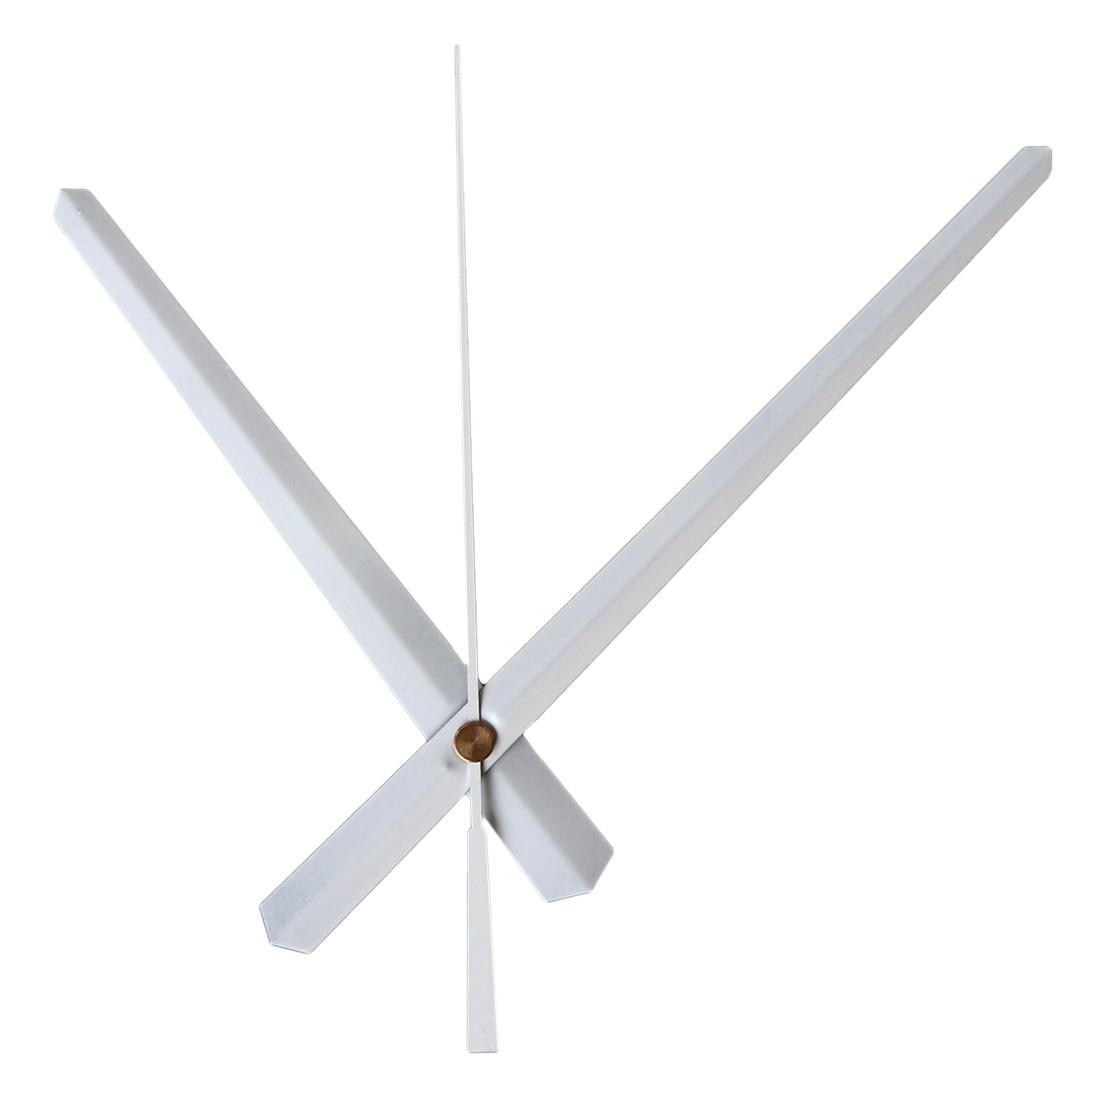 Homingdeco DIY Wall Clock Accessories Metal Pointer Second Hand Minute Hand Hour Hand Set Needles Clocks Home Decor - White